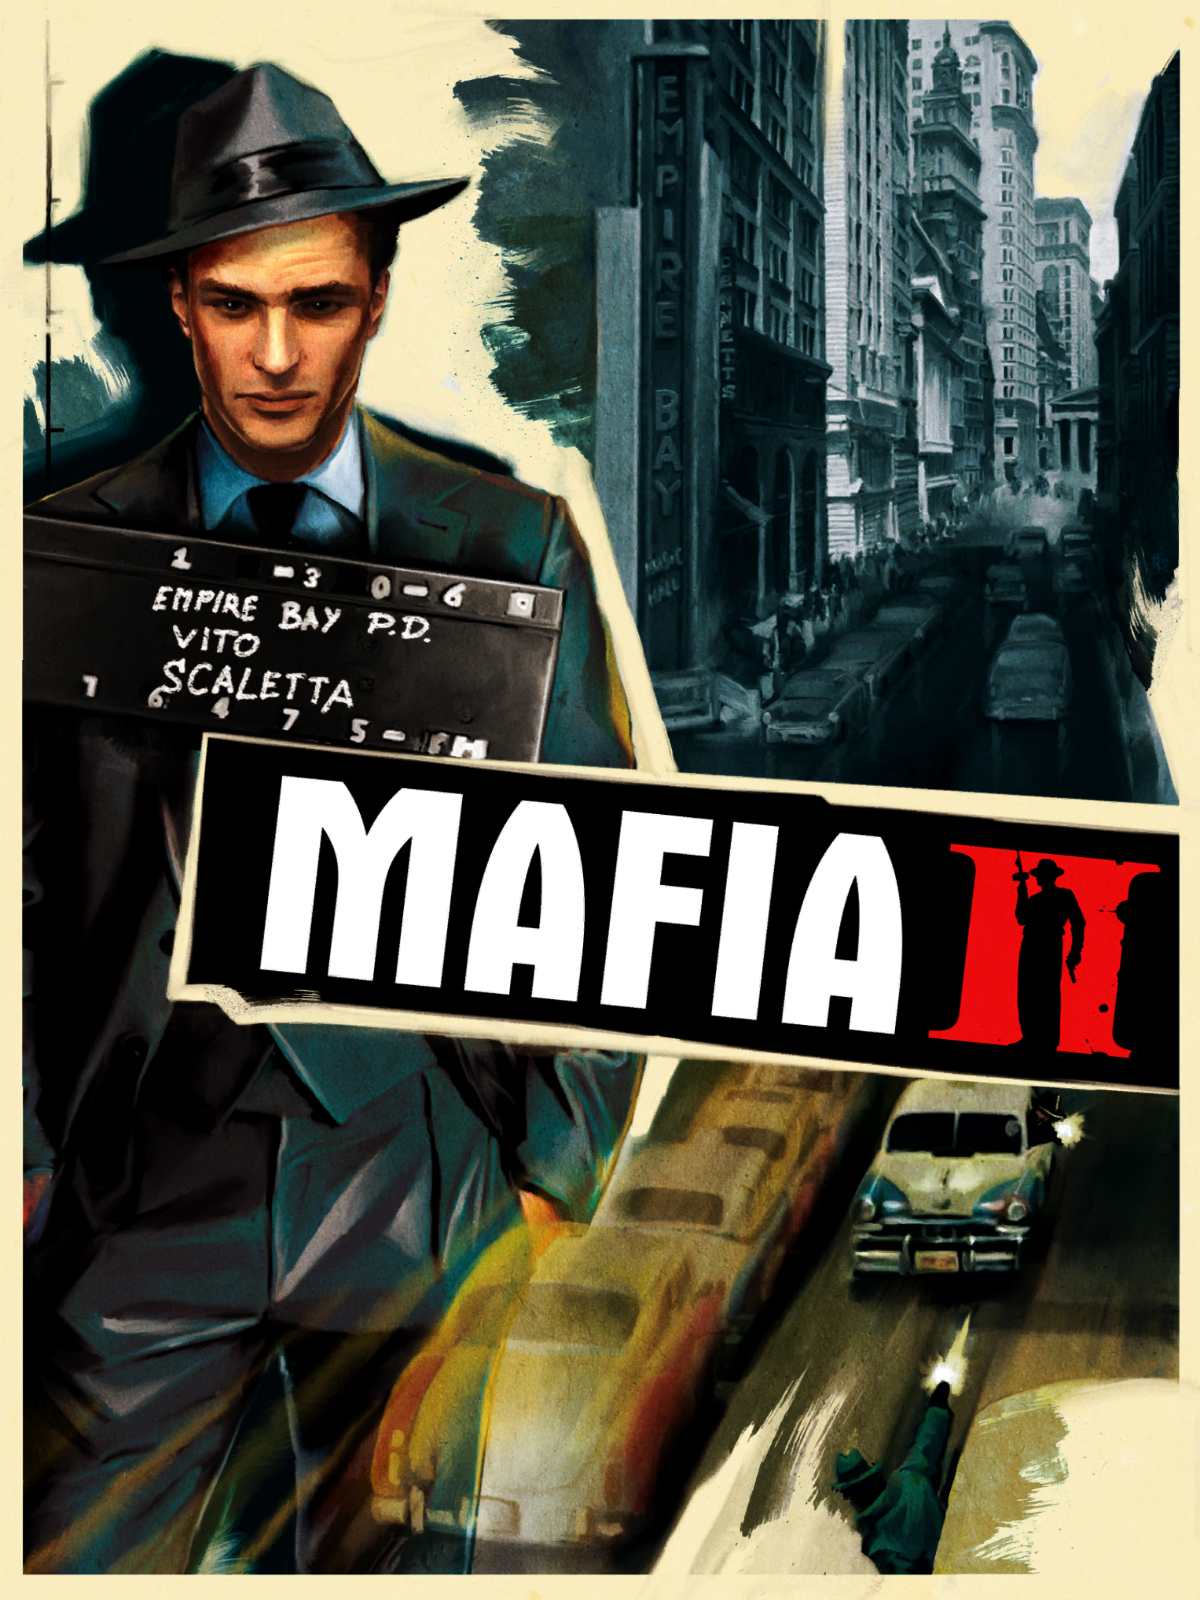 Free Download Mafia Ii Hd Game Wallpapers Desktop Wallpapers